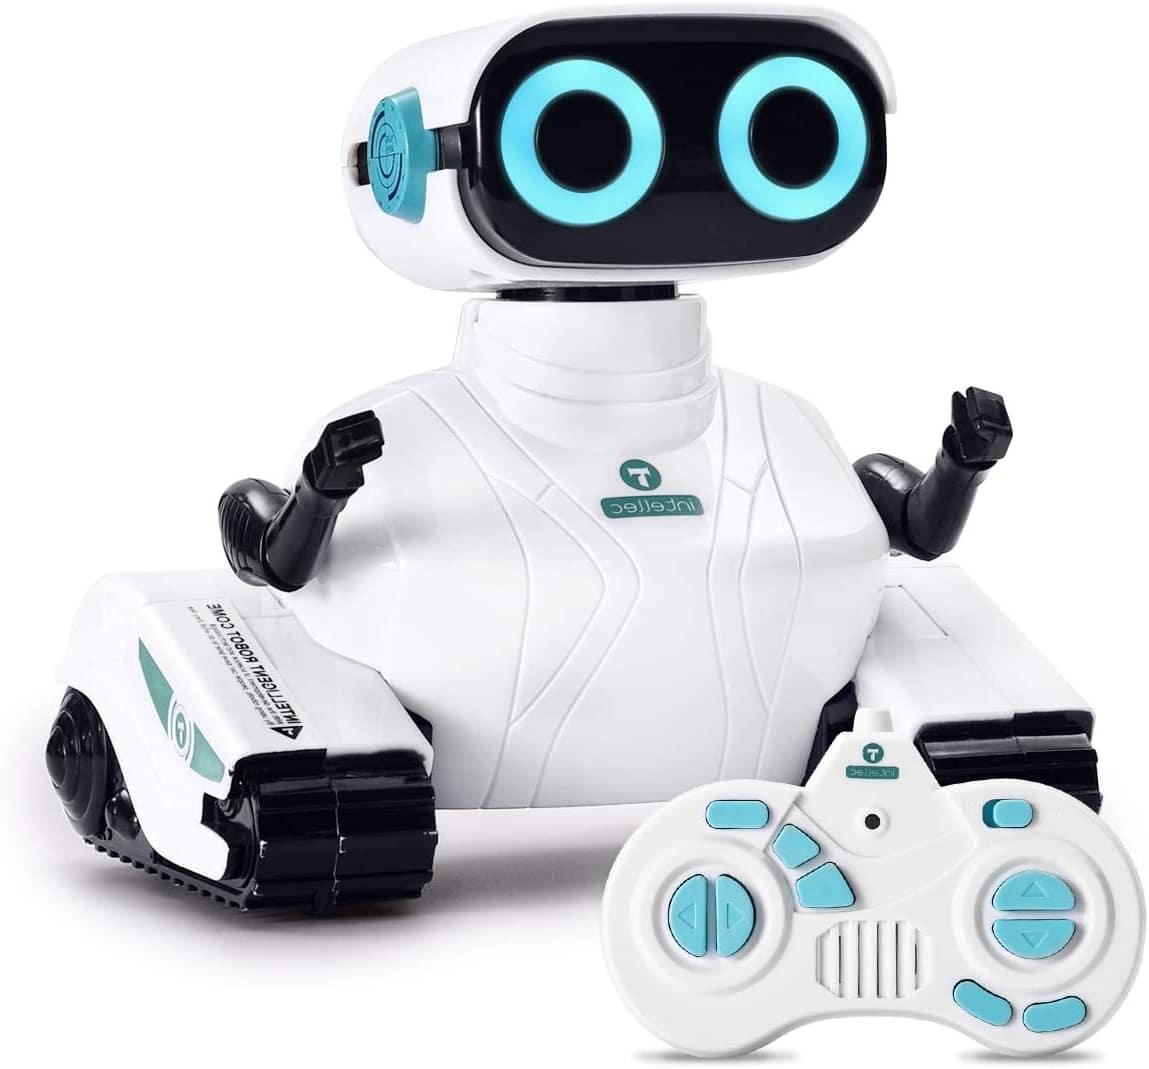 jouet robot intelligent jouet robot qui parle meilleur robot jouet 2019 robot jouet télécommande robot jouet autonome jouet robot chien robot télécommandé